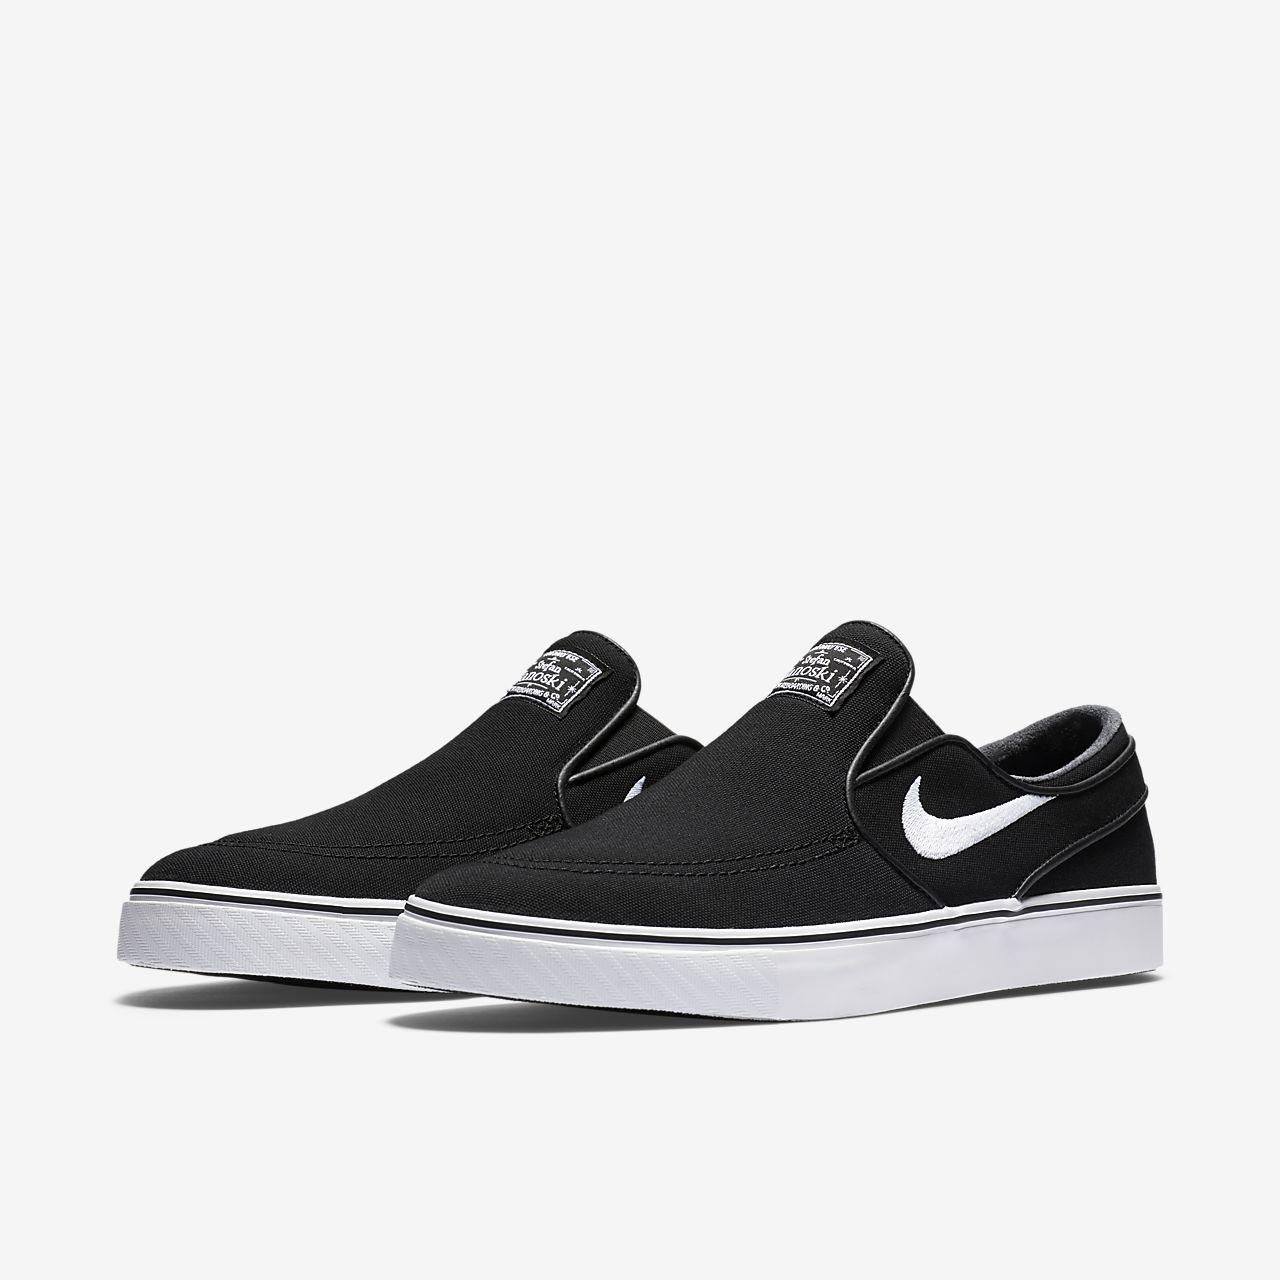 the best attitude 35de6 7da93 ... Nike SB Zoom Stefan Janoski Slip-On Canvas Men s Skateboarding Shoe